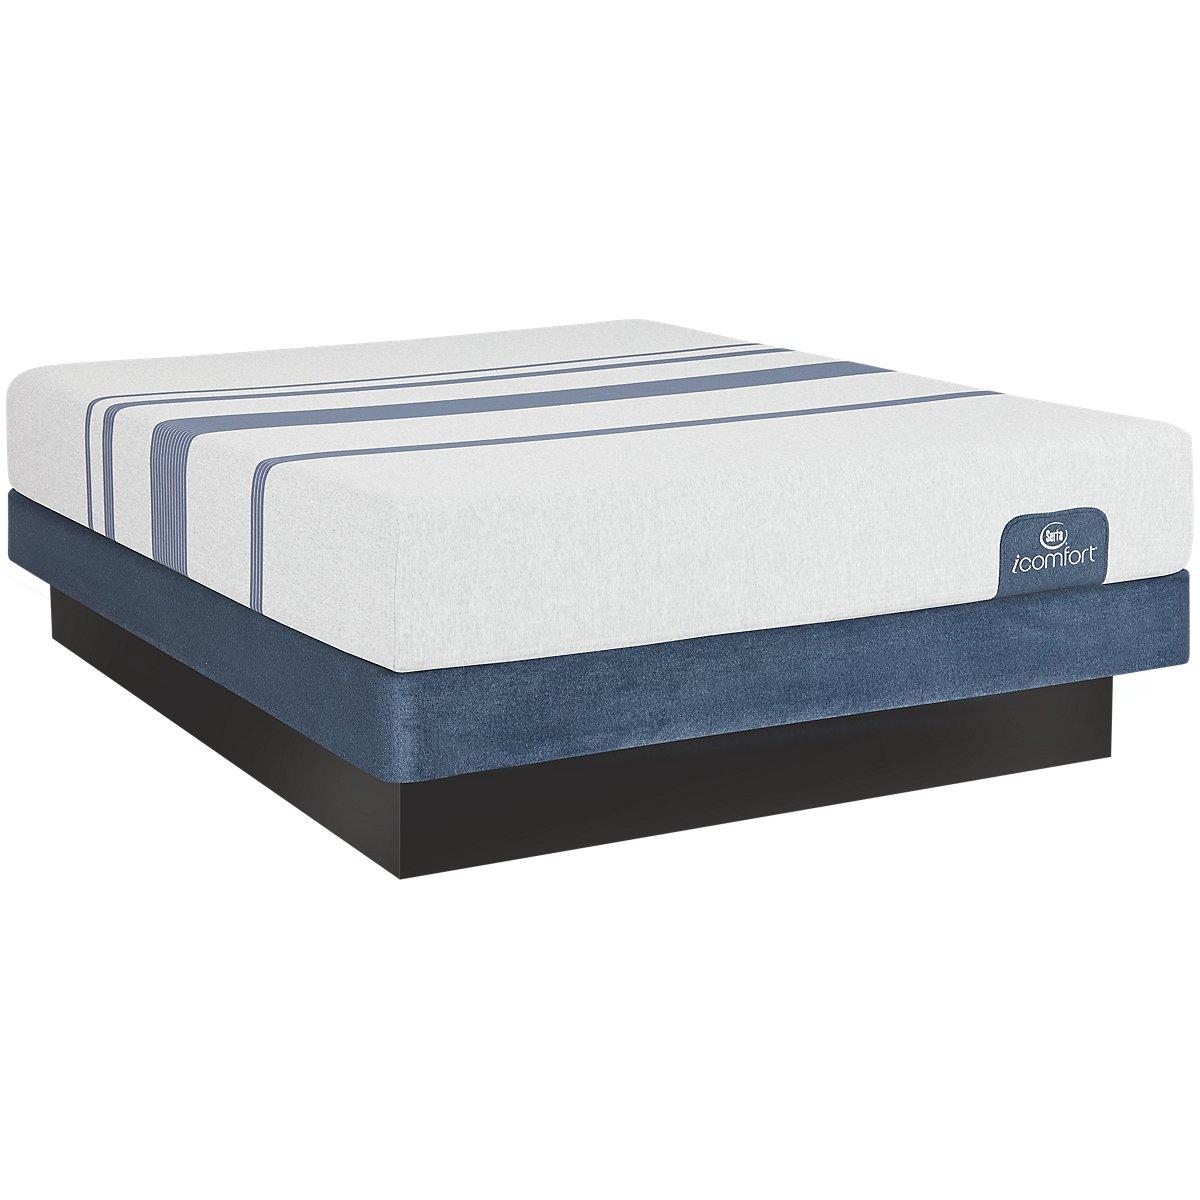 Serta iComfort Blue 100 Firm Low-Profile Mattress Set